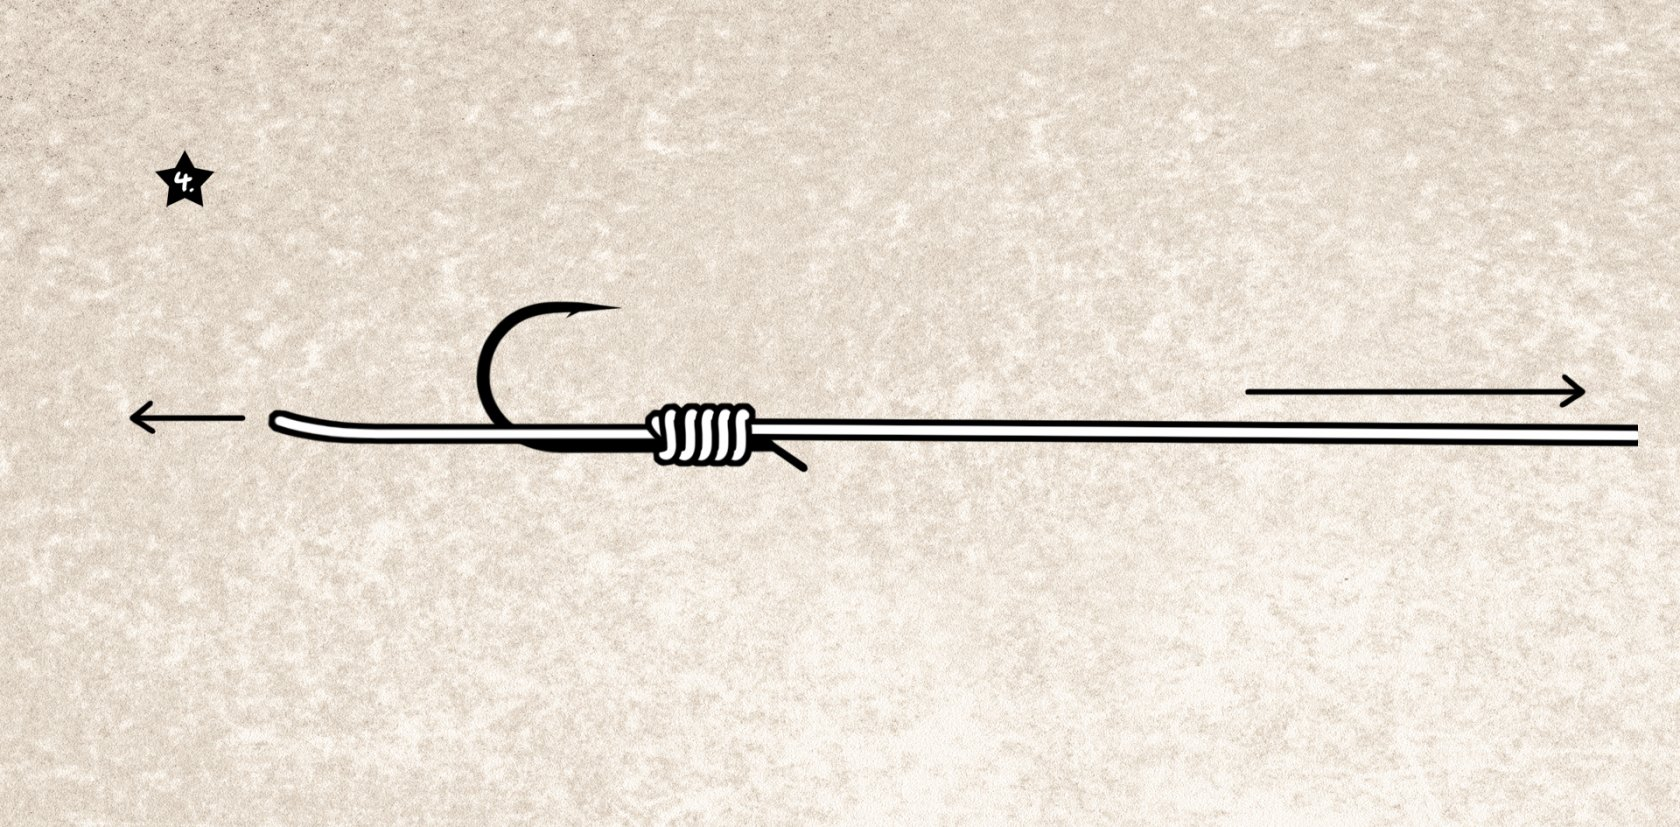 Plättchenhaken-Knoten binden